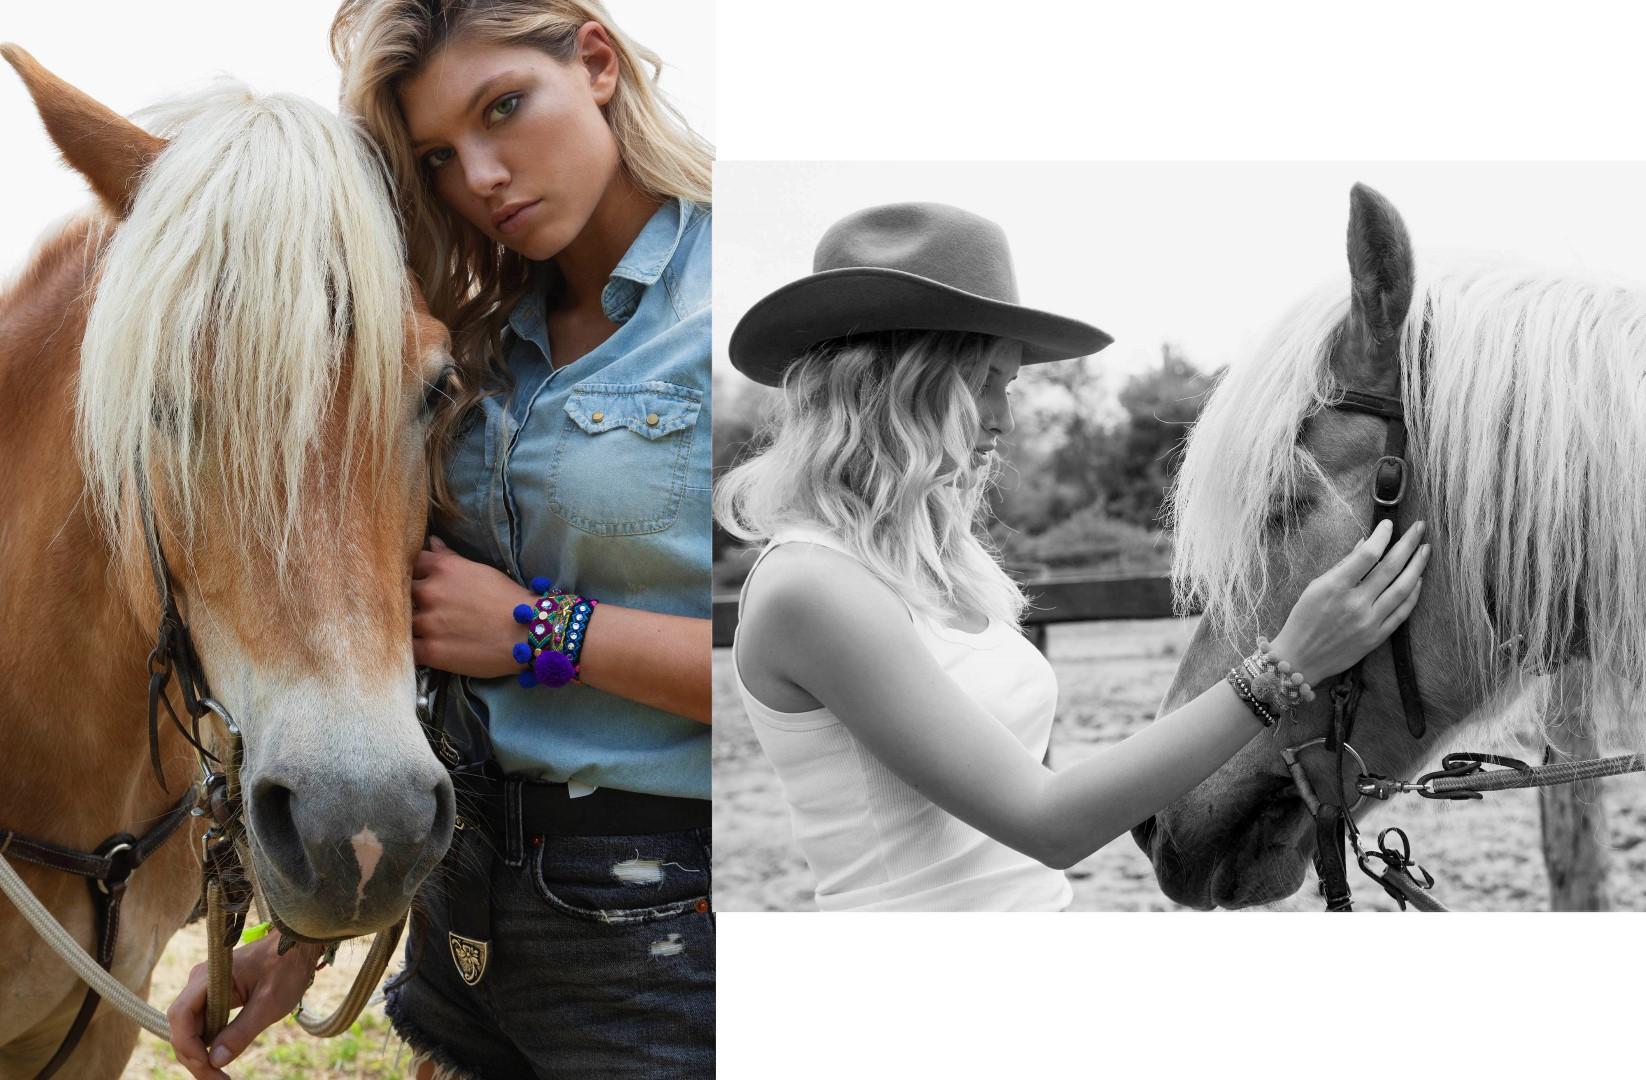 FOTO: Suzana Horvat, Dina Dragija, Petra Kljaić i Zoja Kuterovac u western kampanji